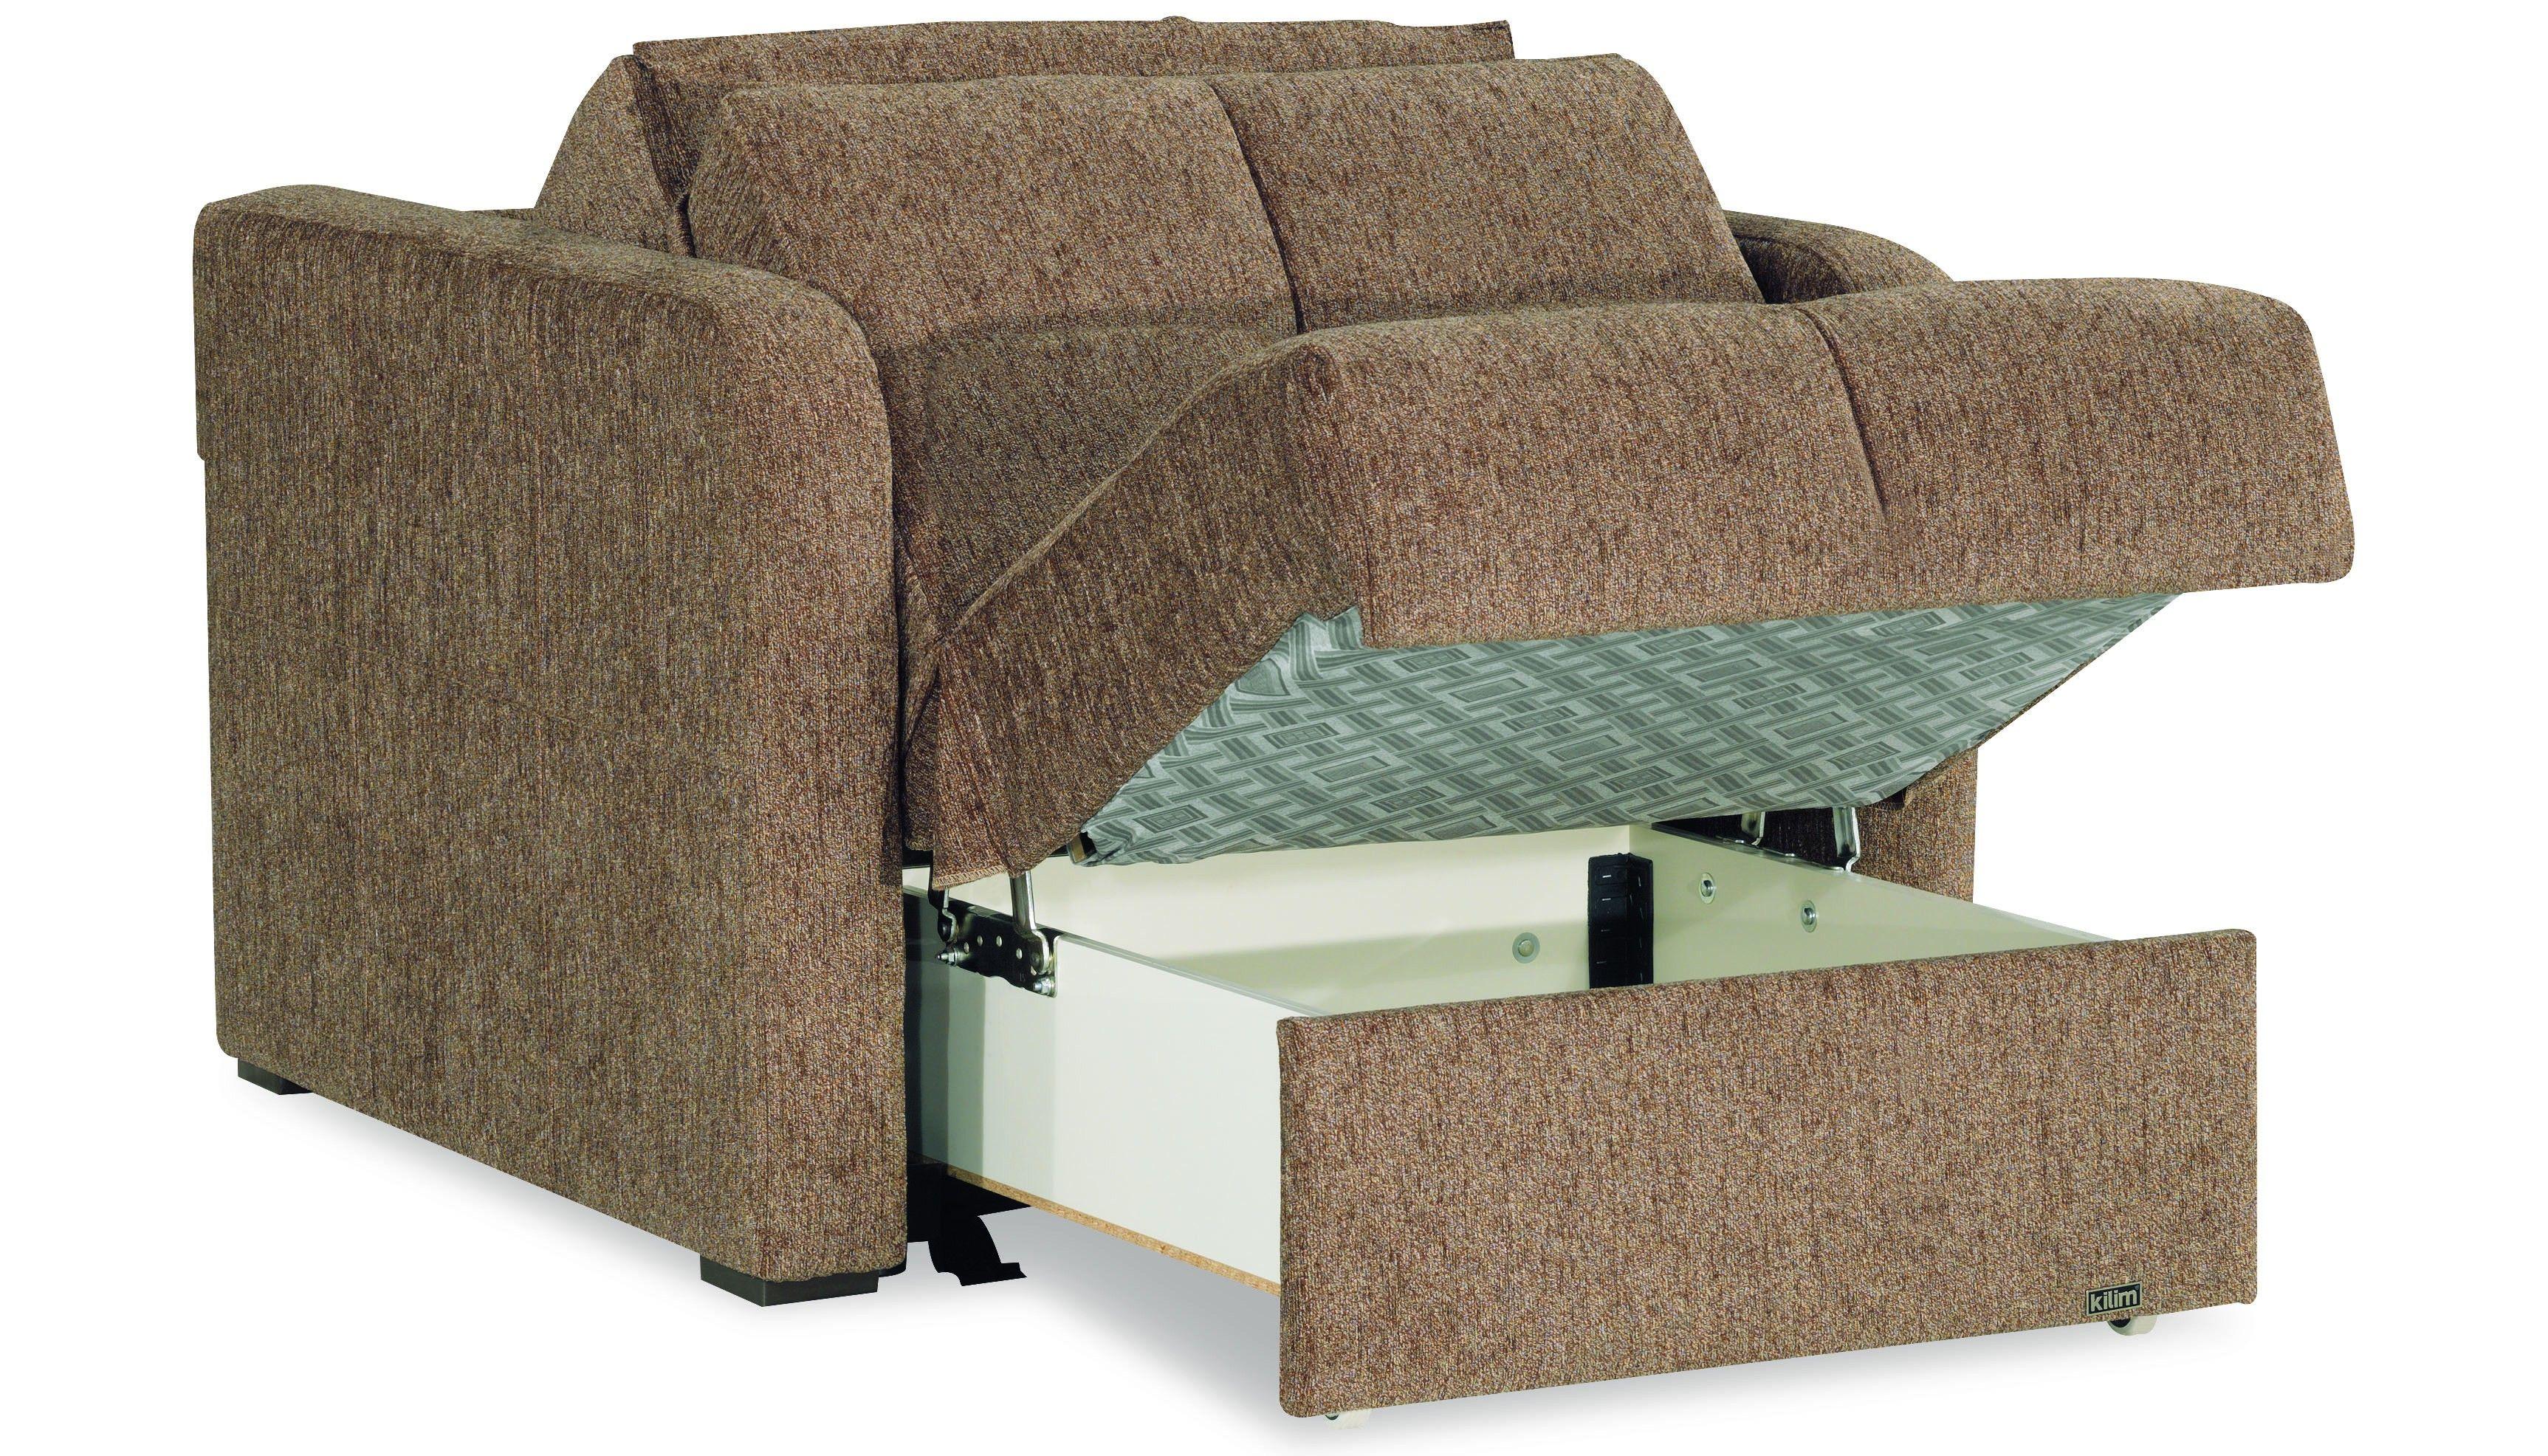 Stuhl Besten Sofa Matratze Bett Am Ikea Sleeper Von wPXuTZkiO